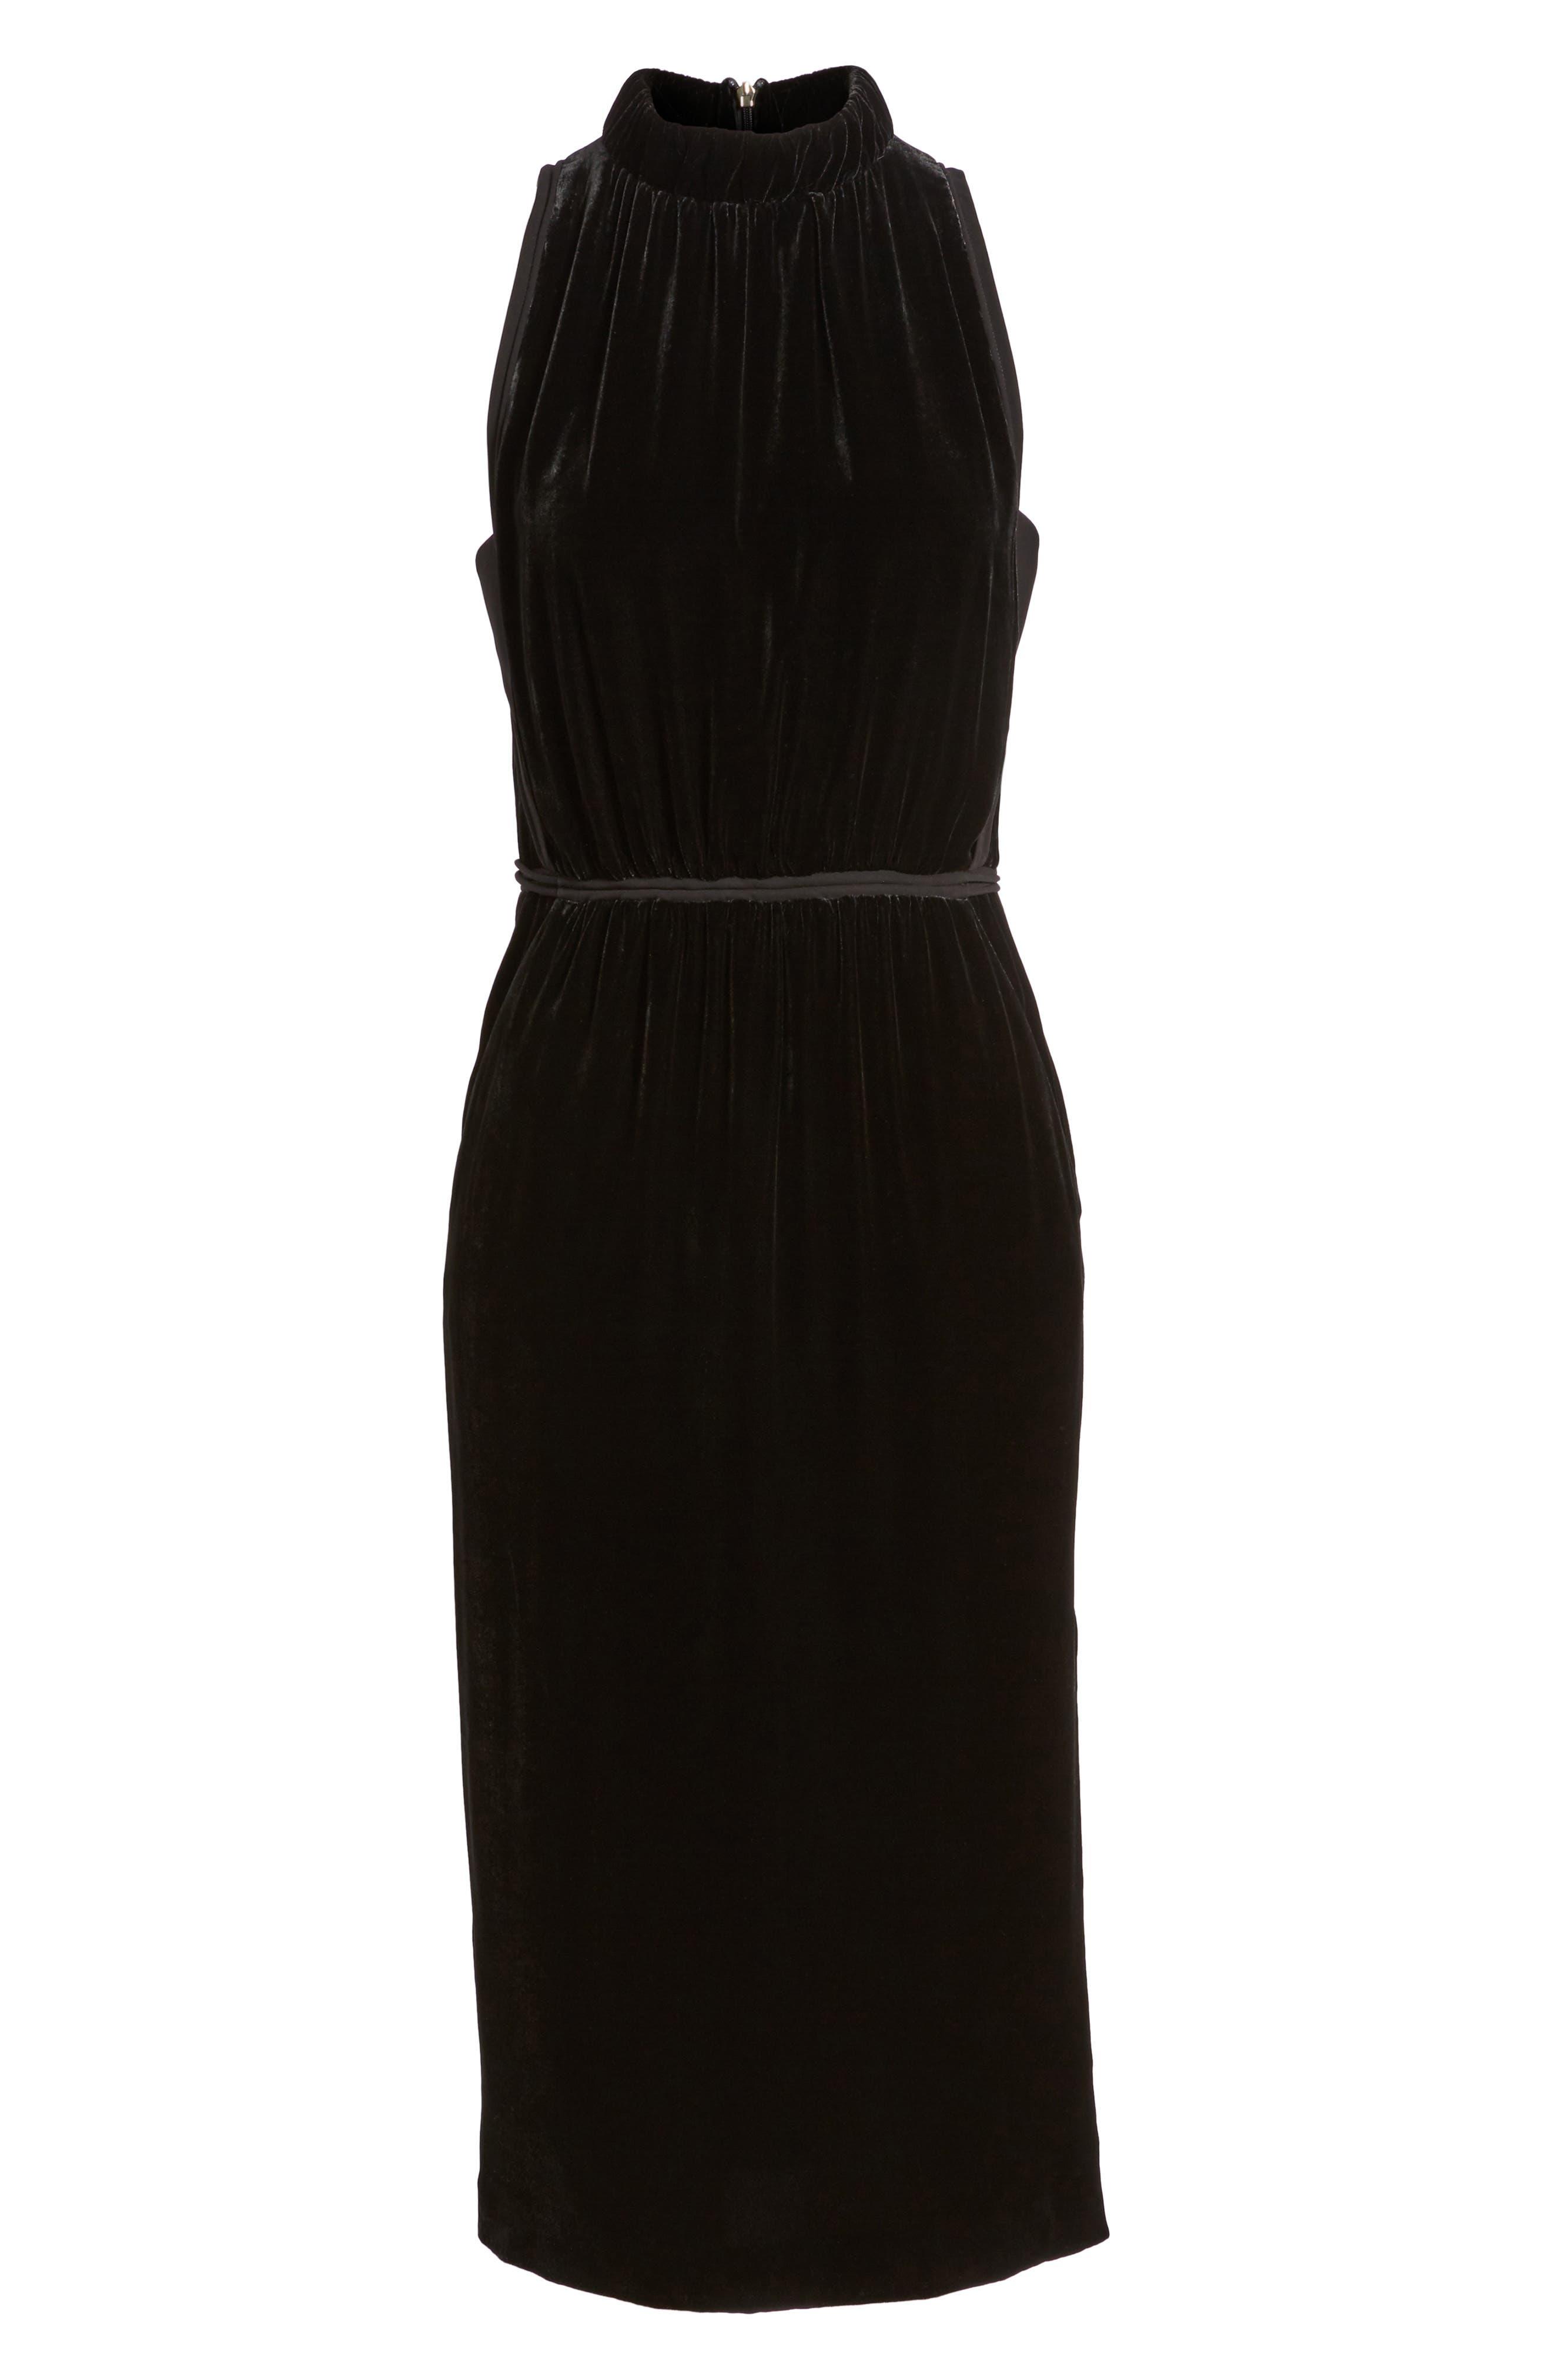 Difosia Velvet Midi Dress,                             Alternate thumbnail 6, color,                             Black